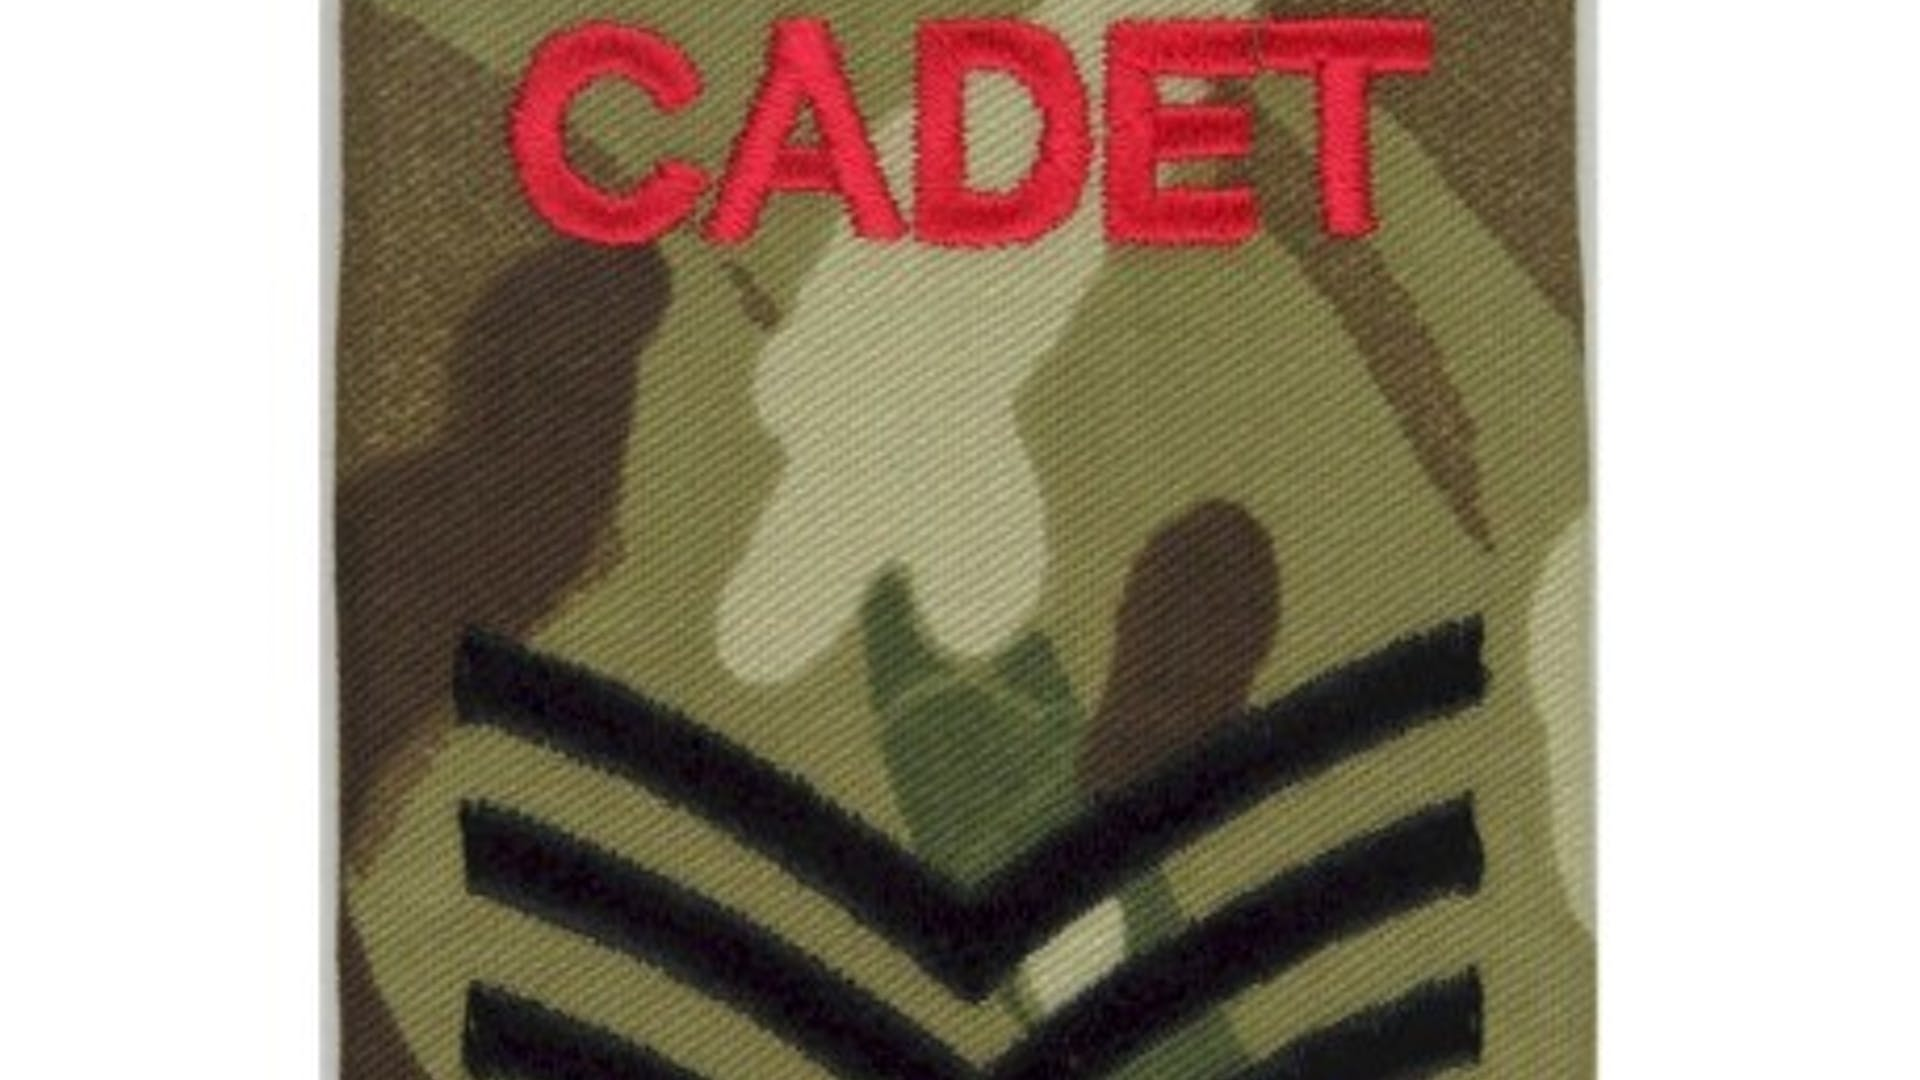 Cadet sergeant mtp camouflage rank slide embroidered nco or officer cadet rank badge